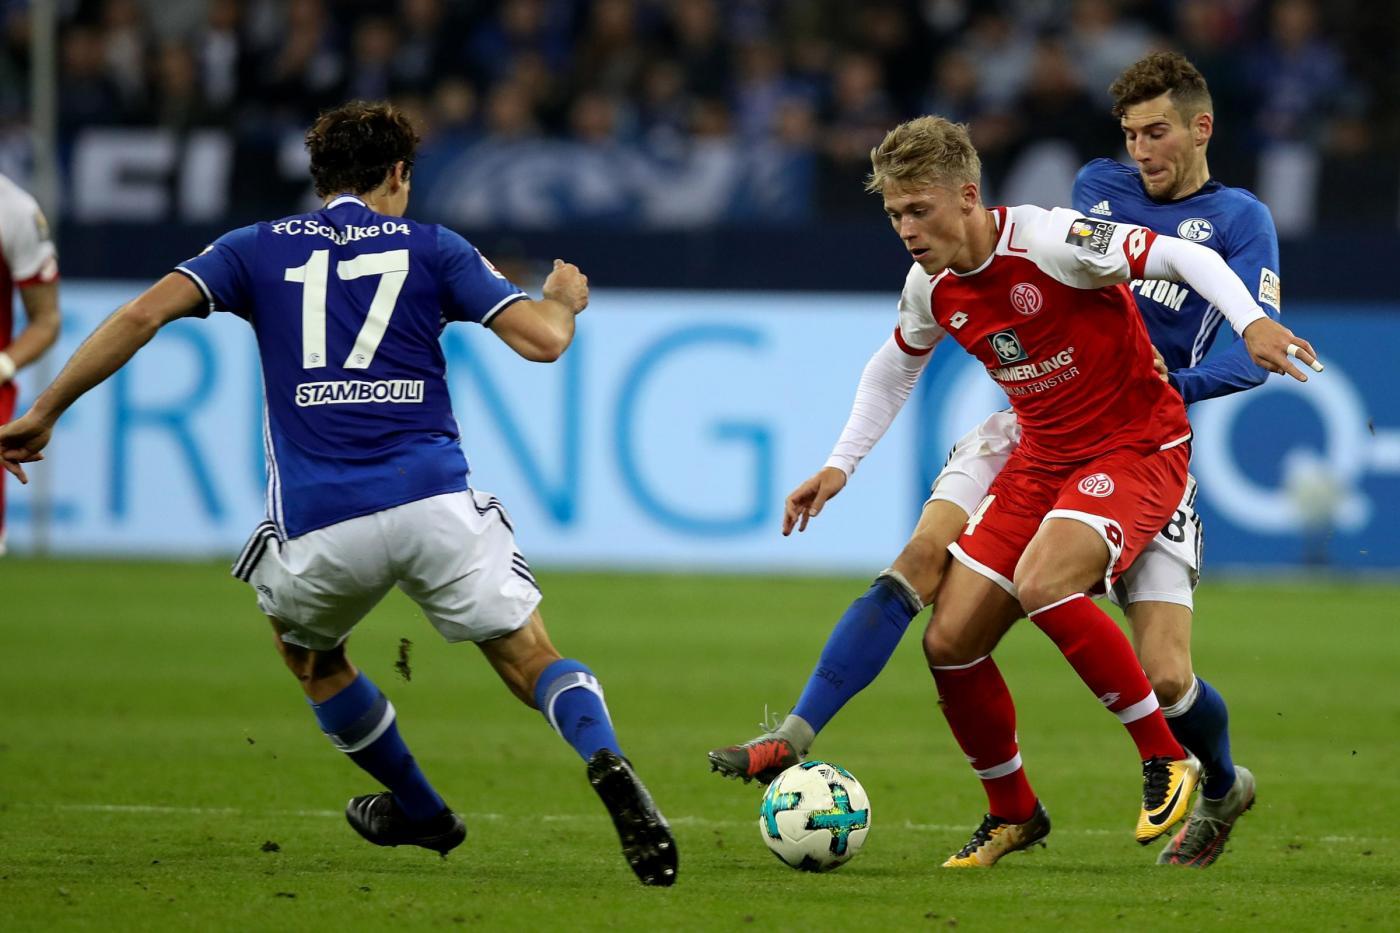 Hannover-RB Lipsia 31 marzo, analisi e pronostico Bundesliga